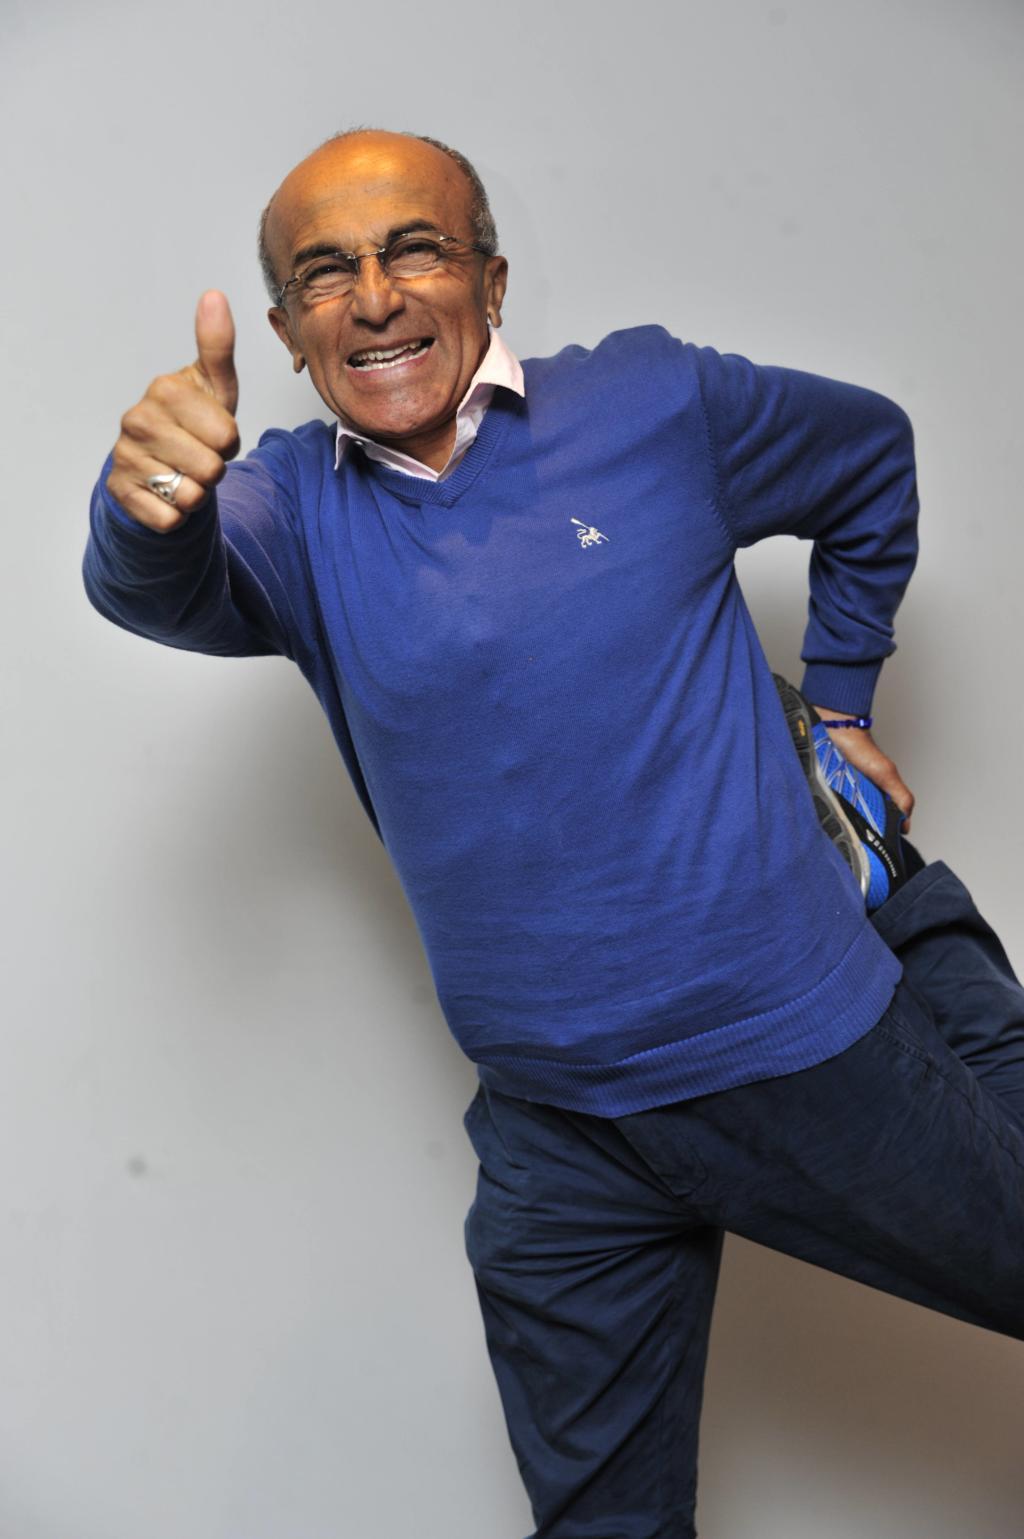 José Luis Pérez Albela